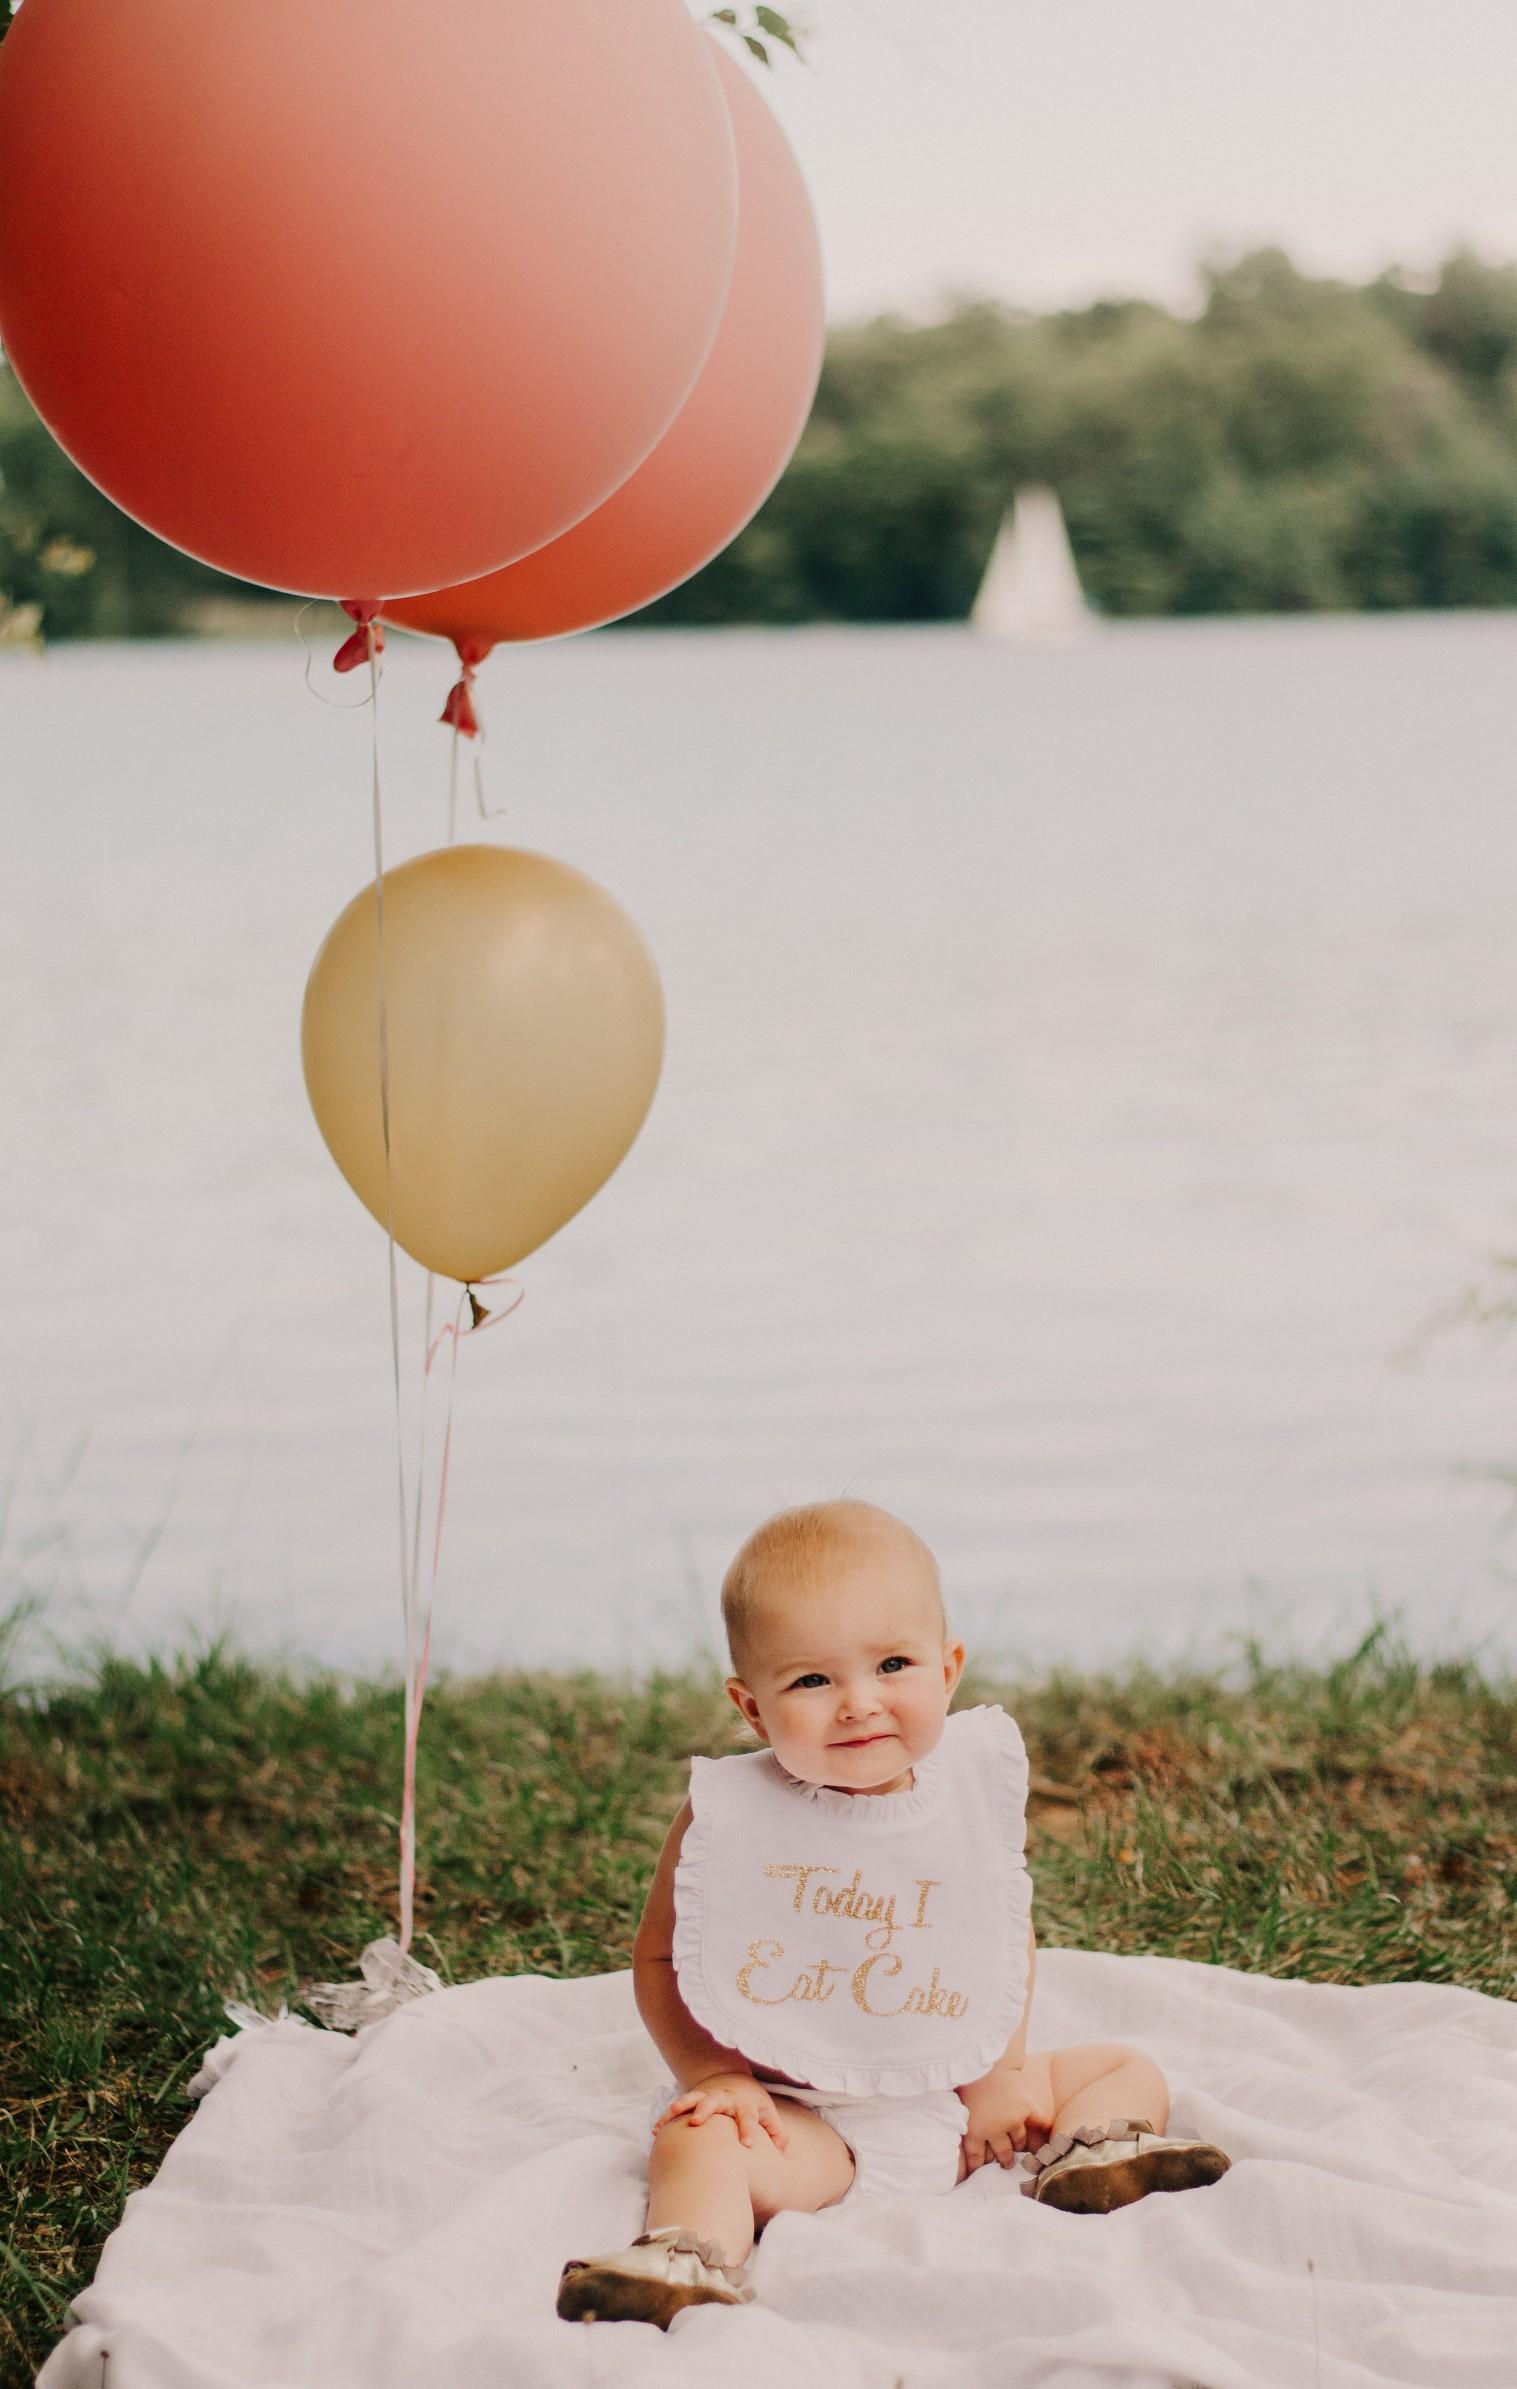 child-photography-first-birthday.jpg.